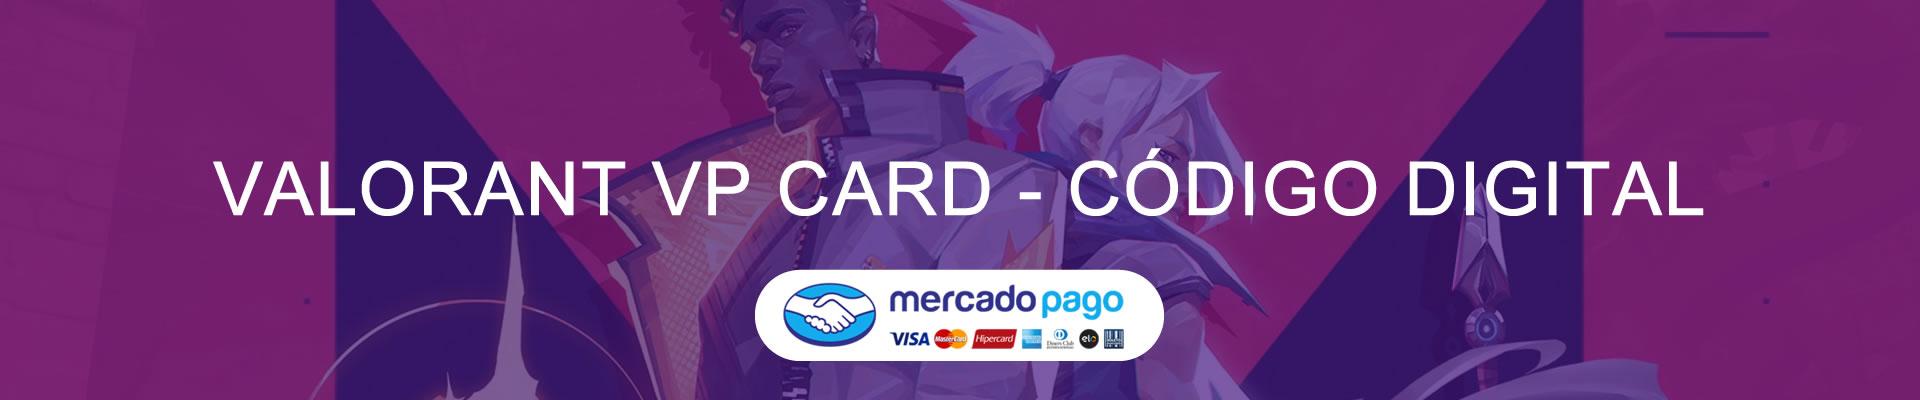 valorant-vp-card